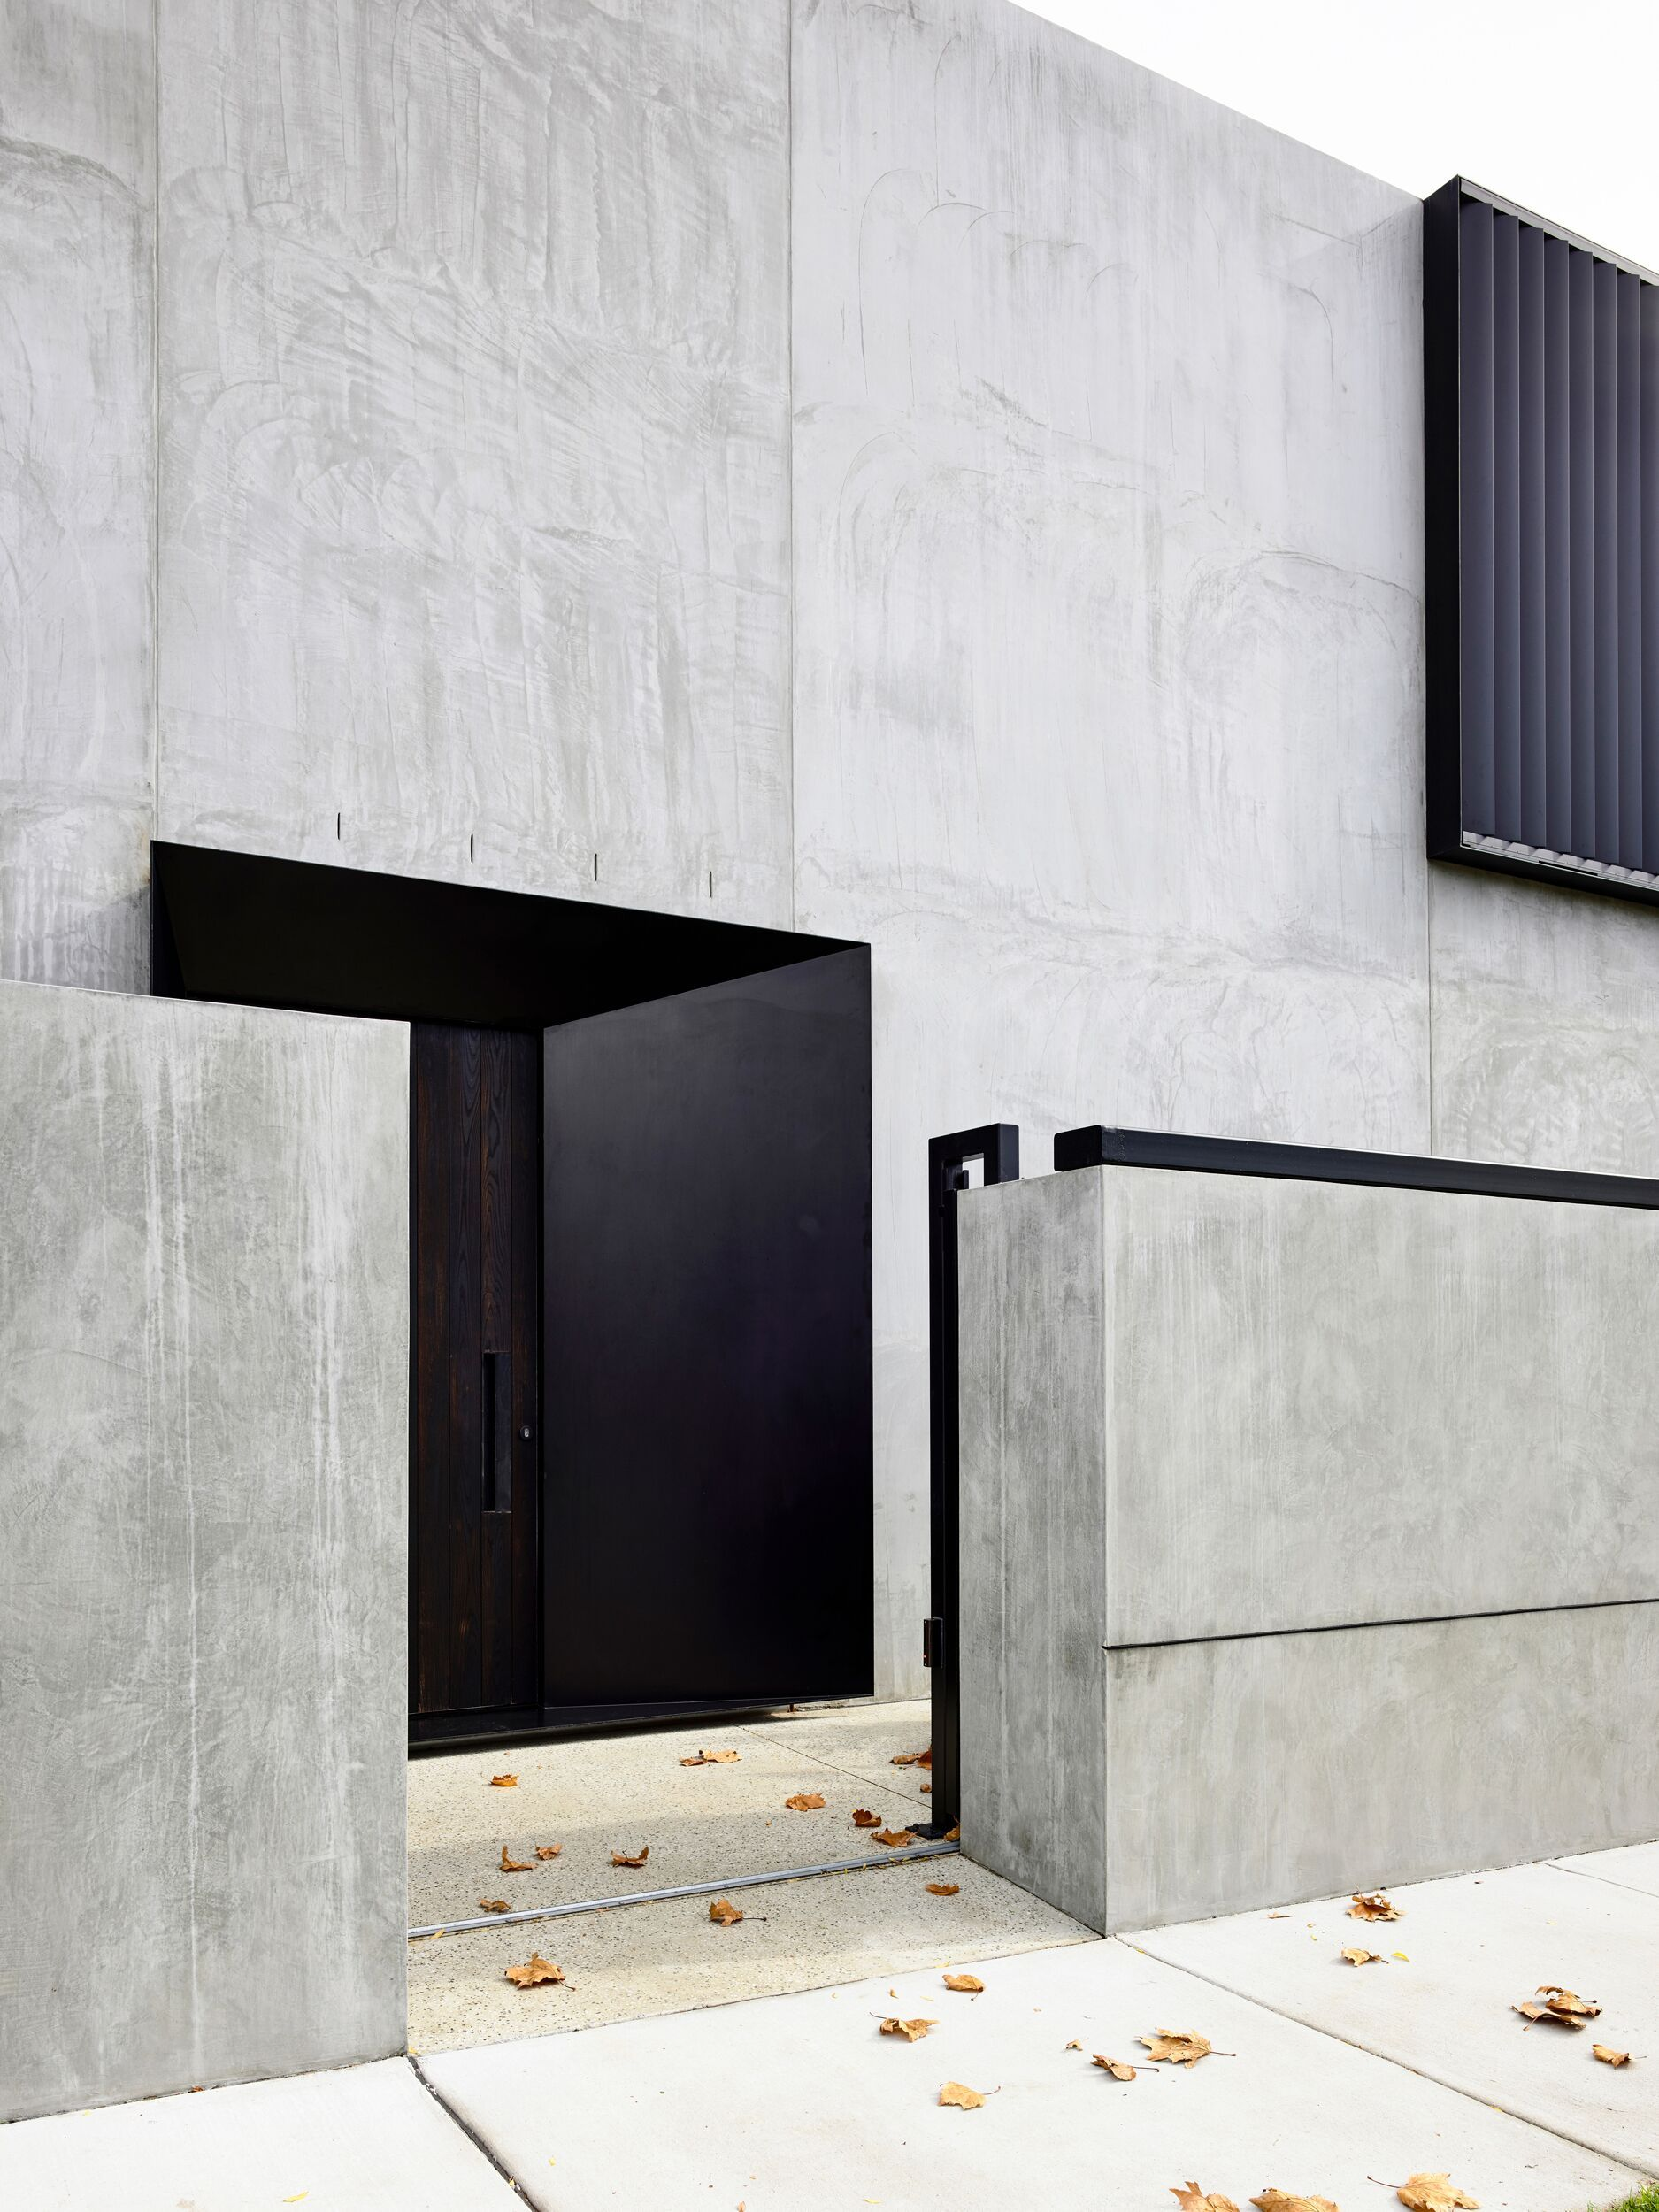 Light Vault House by Chamberlain Architects - The Brighton